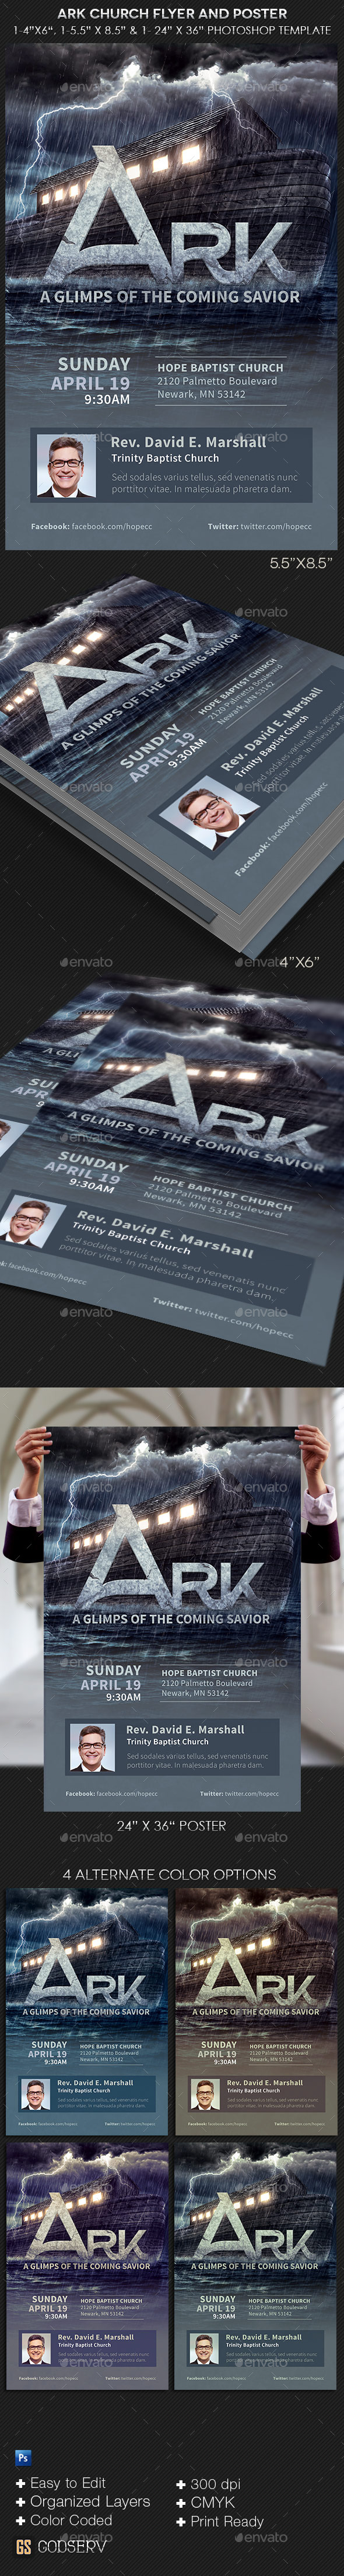 Ark Church Flyer Poster Template